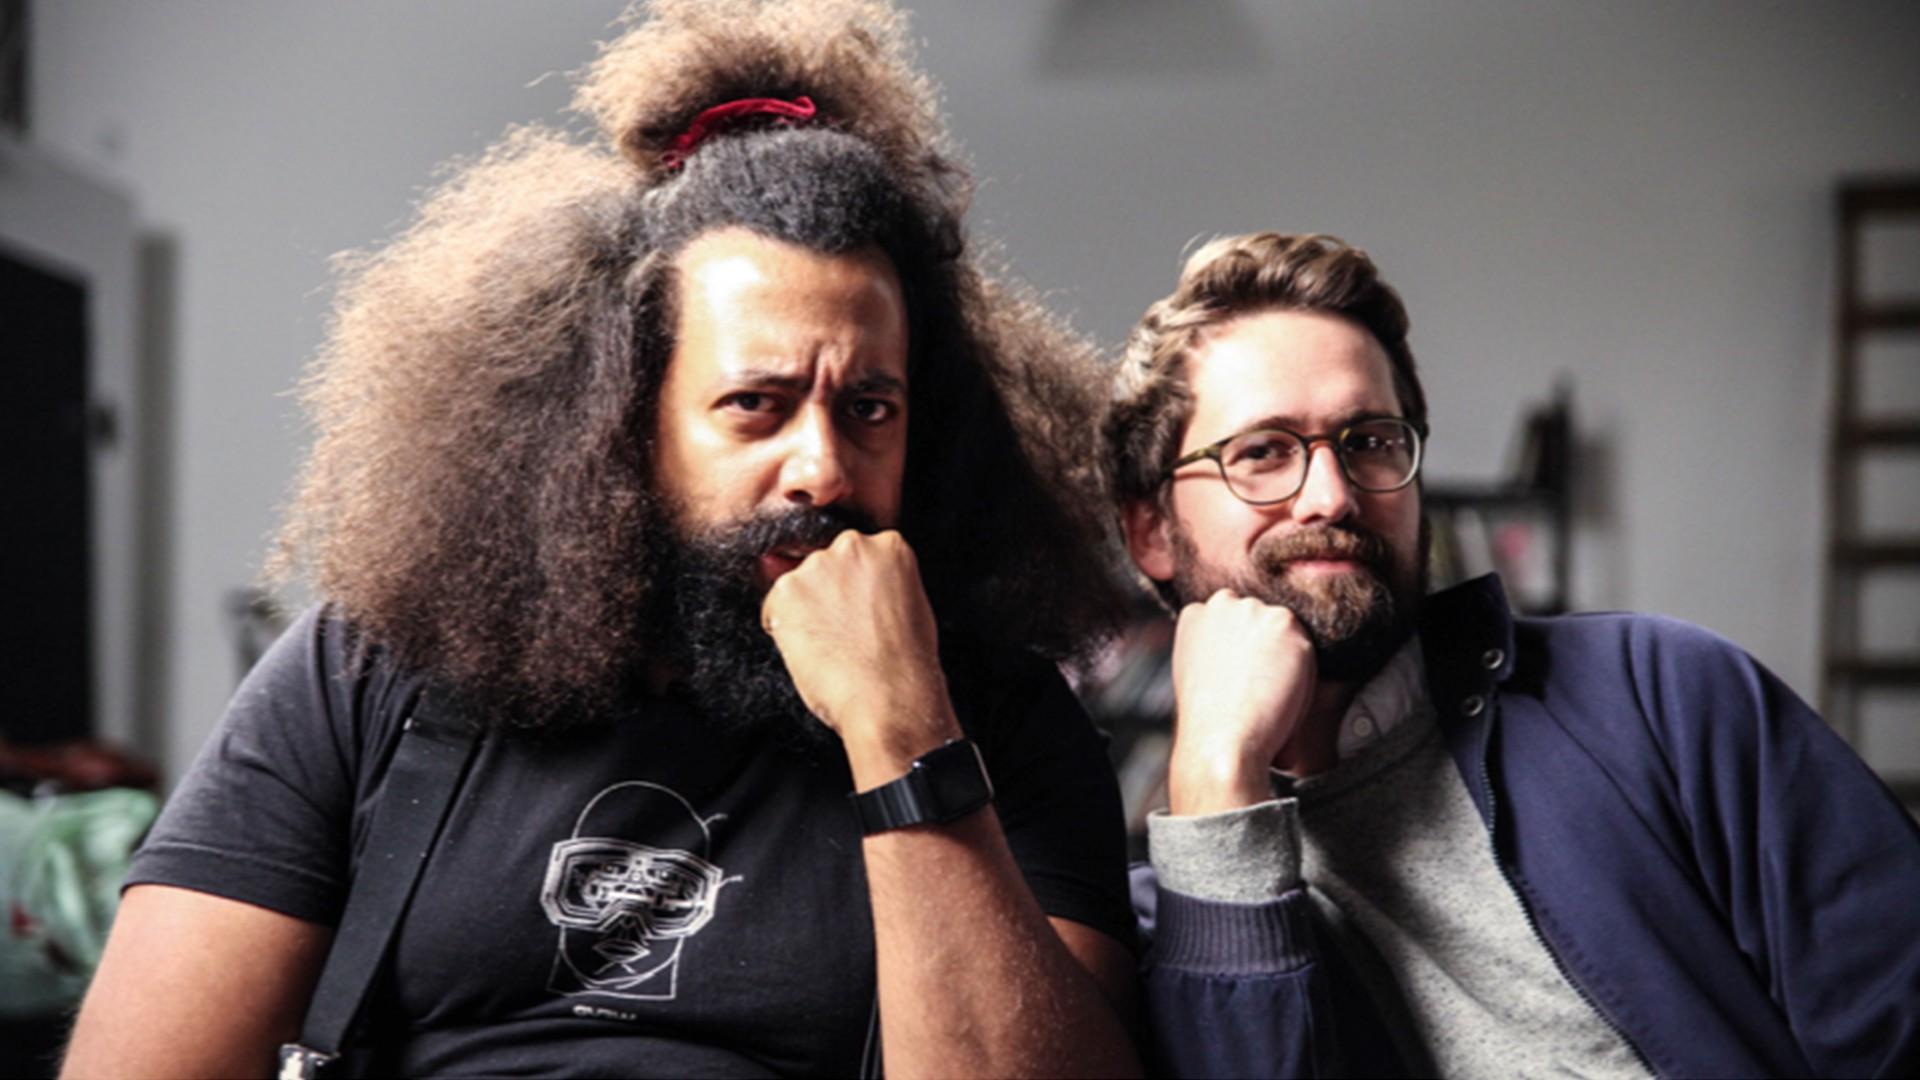 Reggie Watts and Benjamin Dickinson on the Dystopian Future